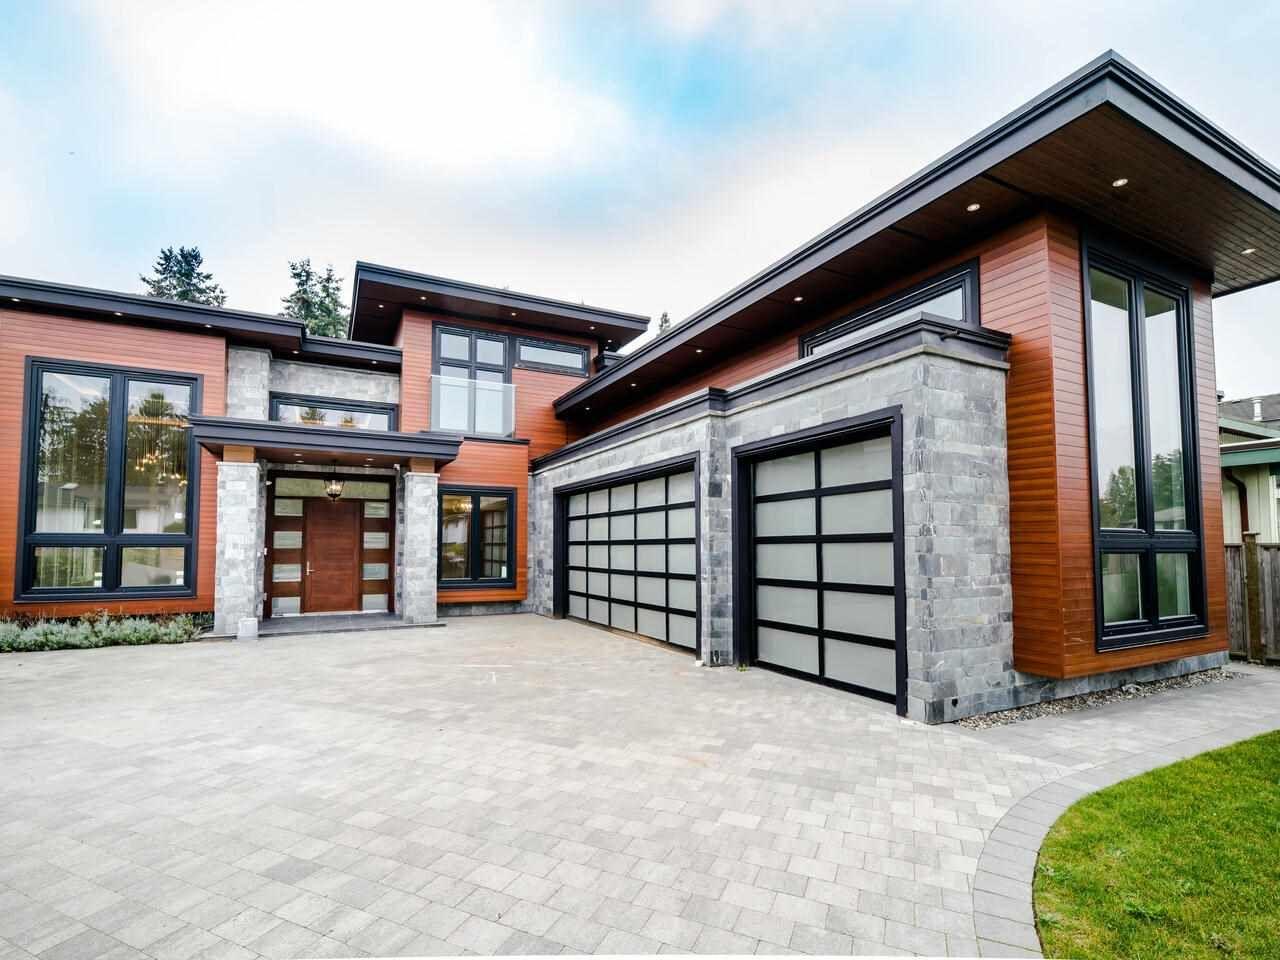 Main Photo: 8300 LUNEN Road in Richmond: Garden City House for sale : MLS®# R2522904